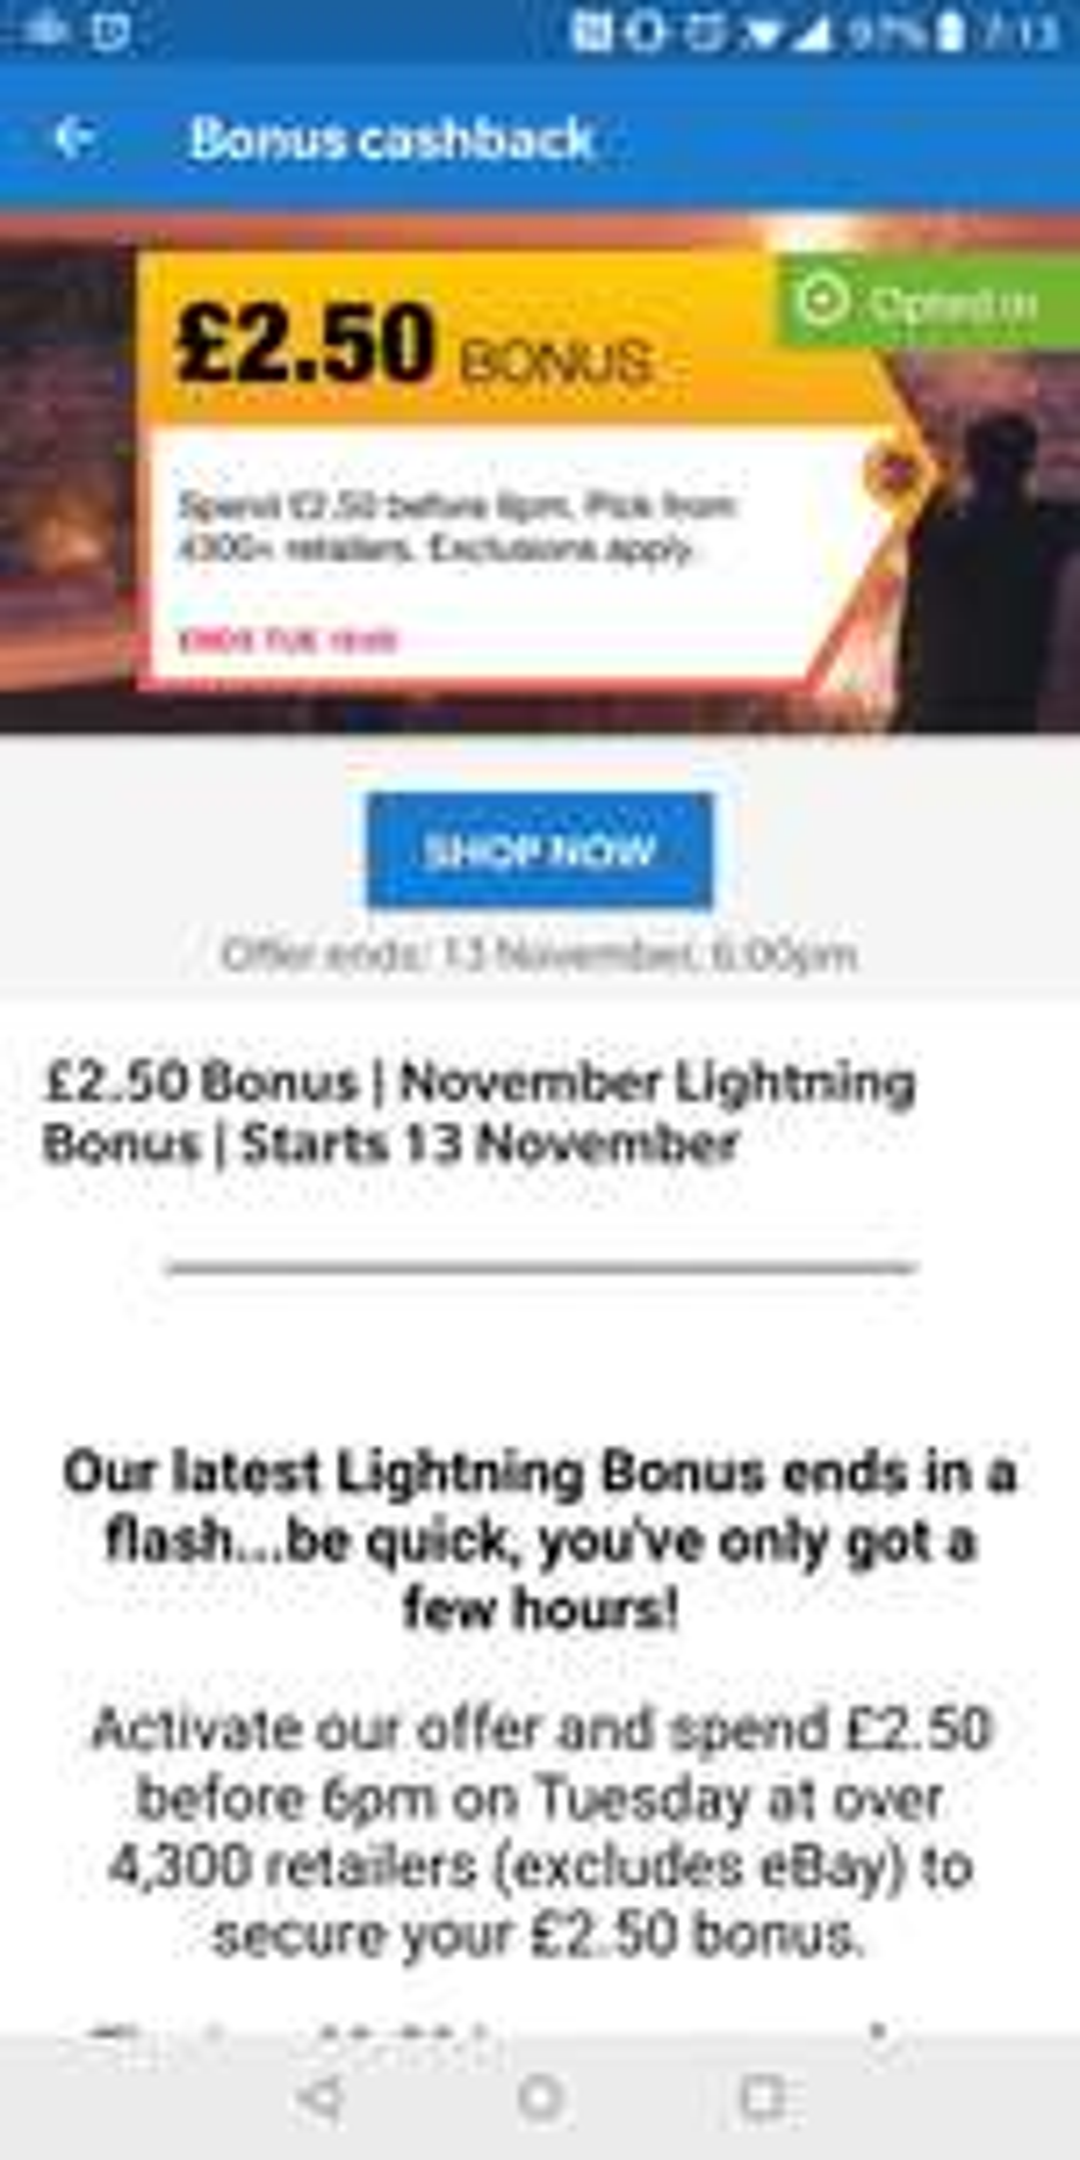 £2.50 Bonus cashback on a £2.50 spend at Quidco - until 6pm tonight